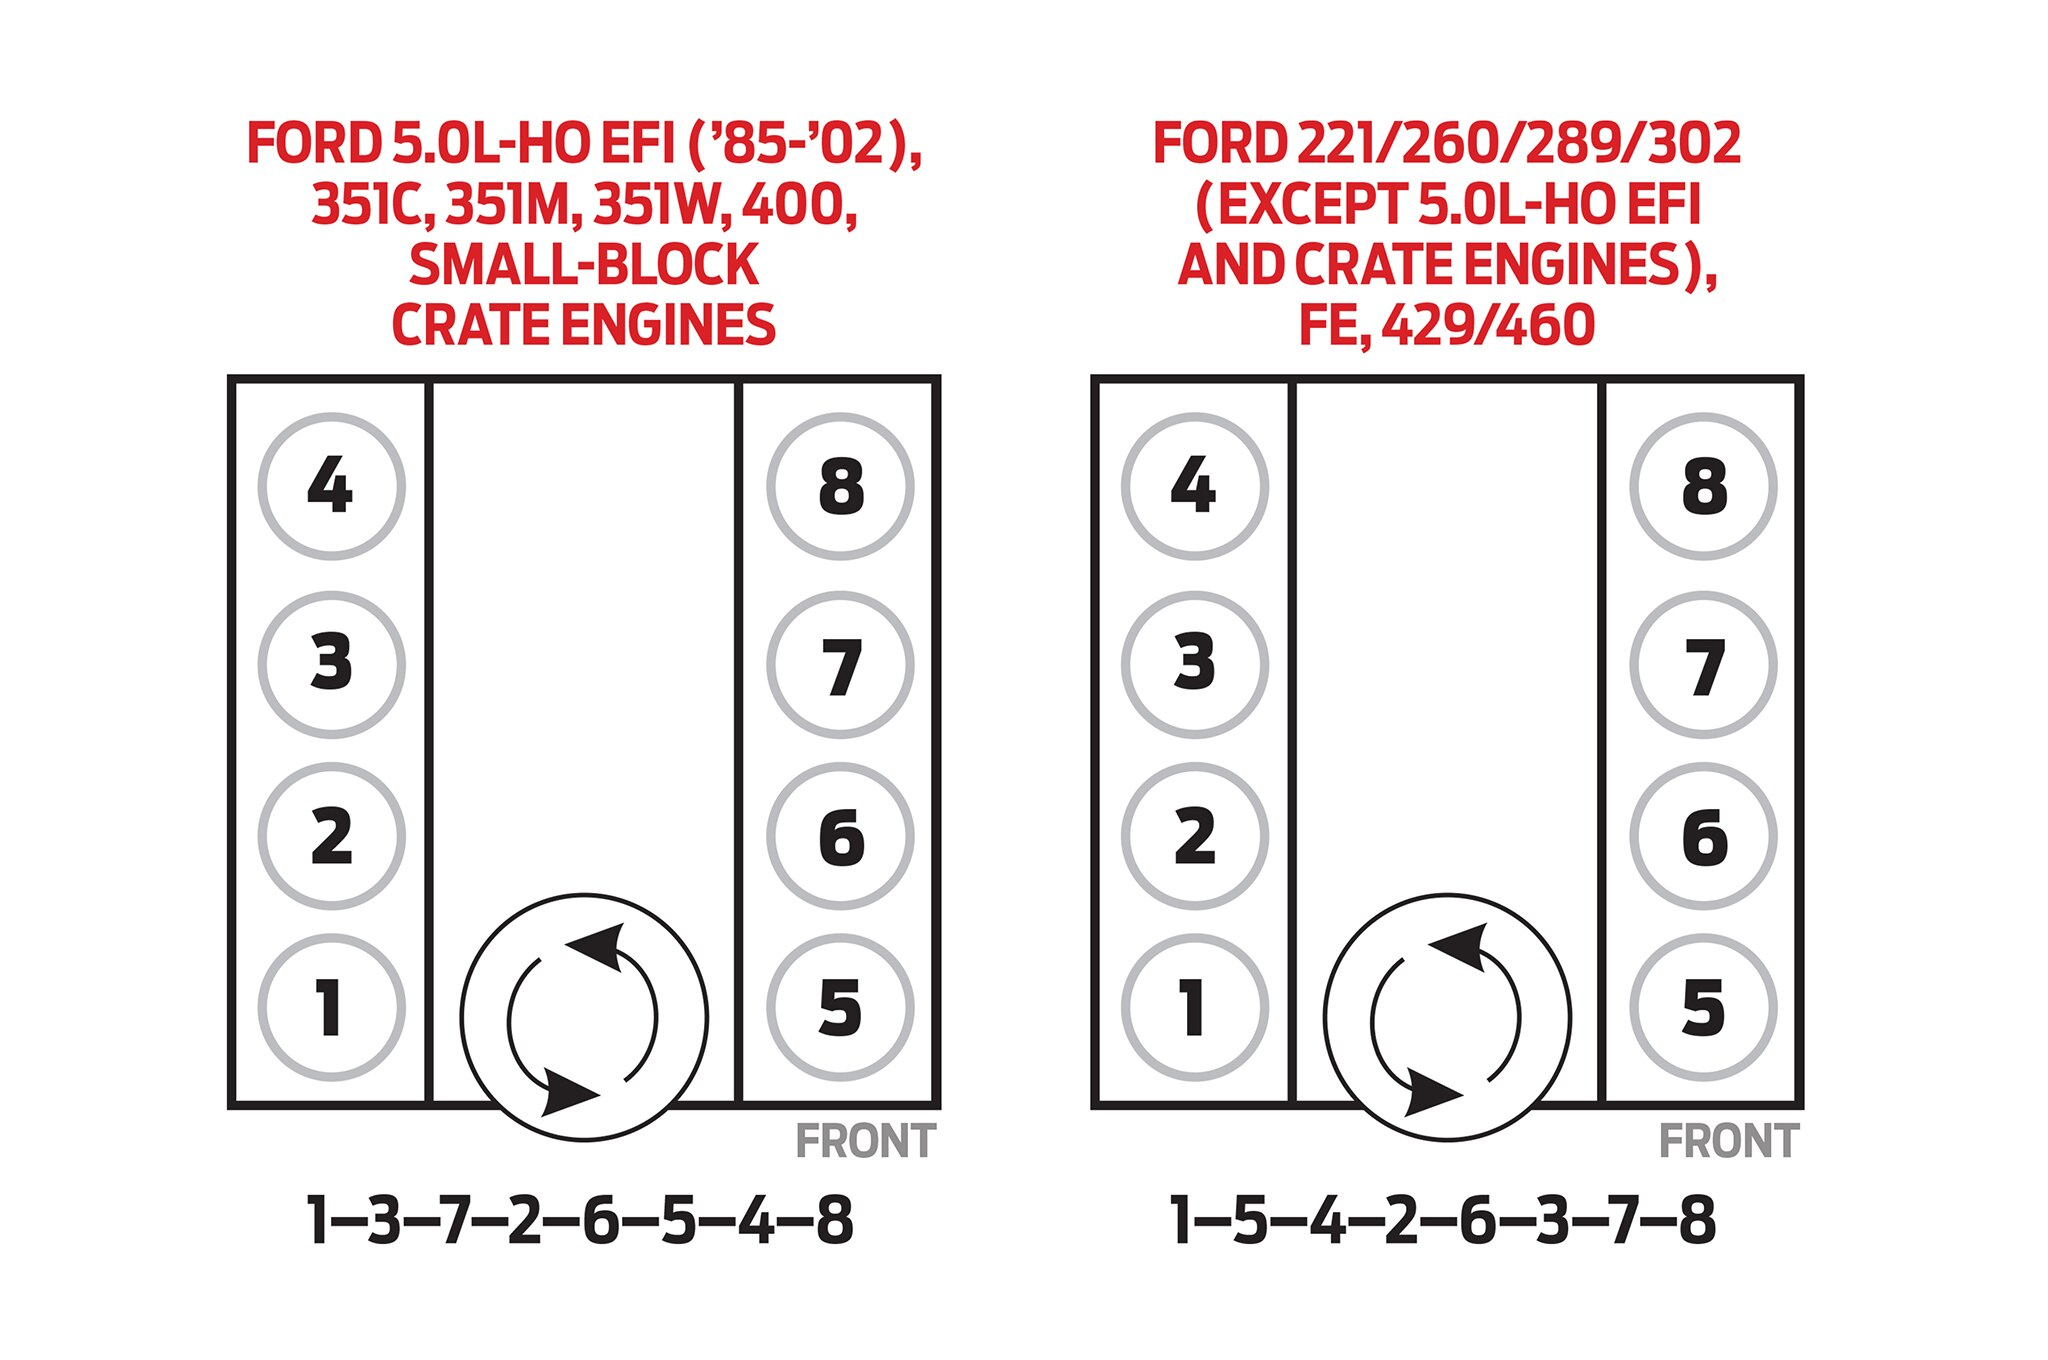 Wiring Diagram Ford 302 Firing - 1986 Gmc Wiring Diagram